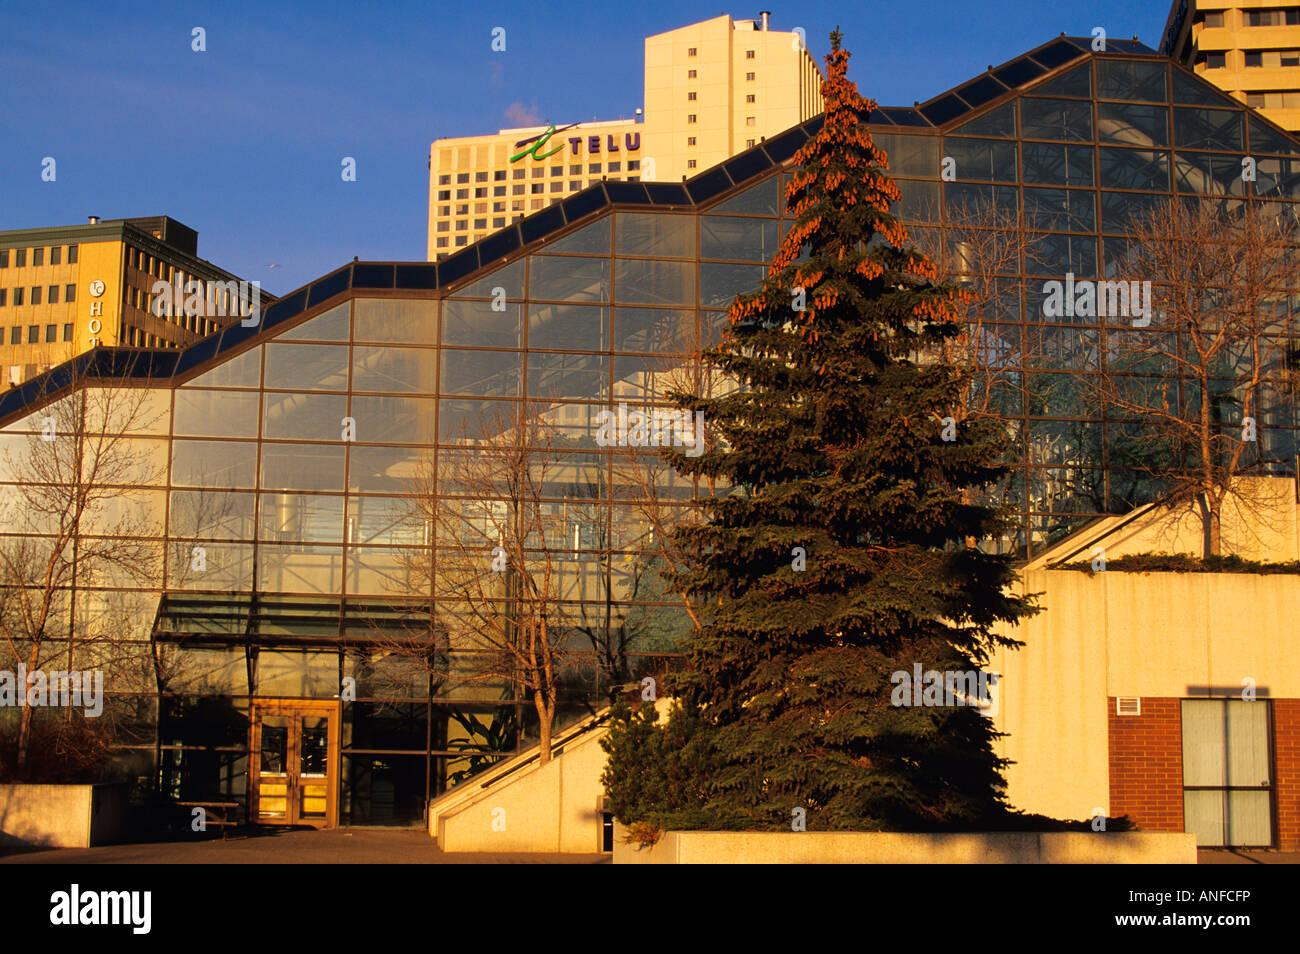 Edmonton incontri annunci